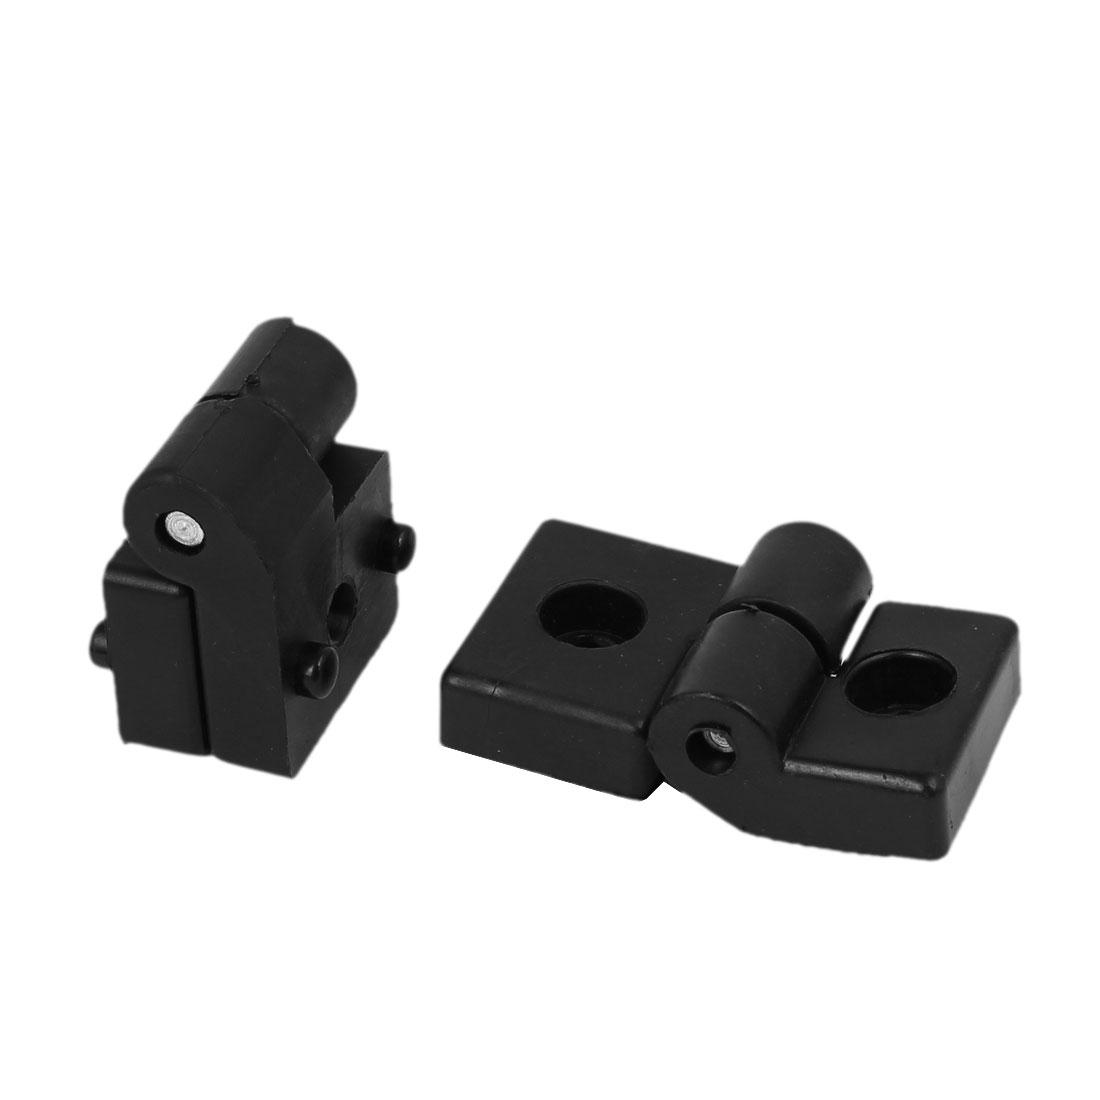 Home Office Plastic 270 Degree Door Bearing Butt Hinge Black 65mmx32mmx20mm 2pcs